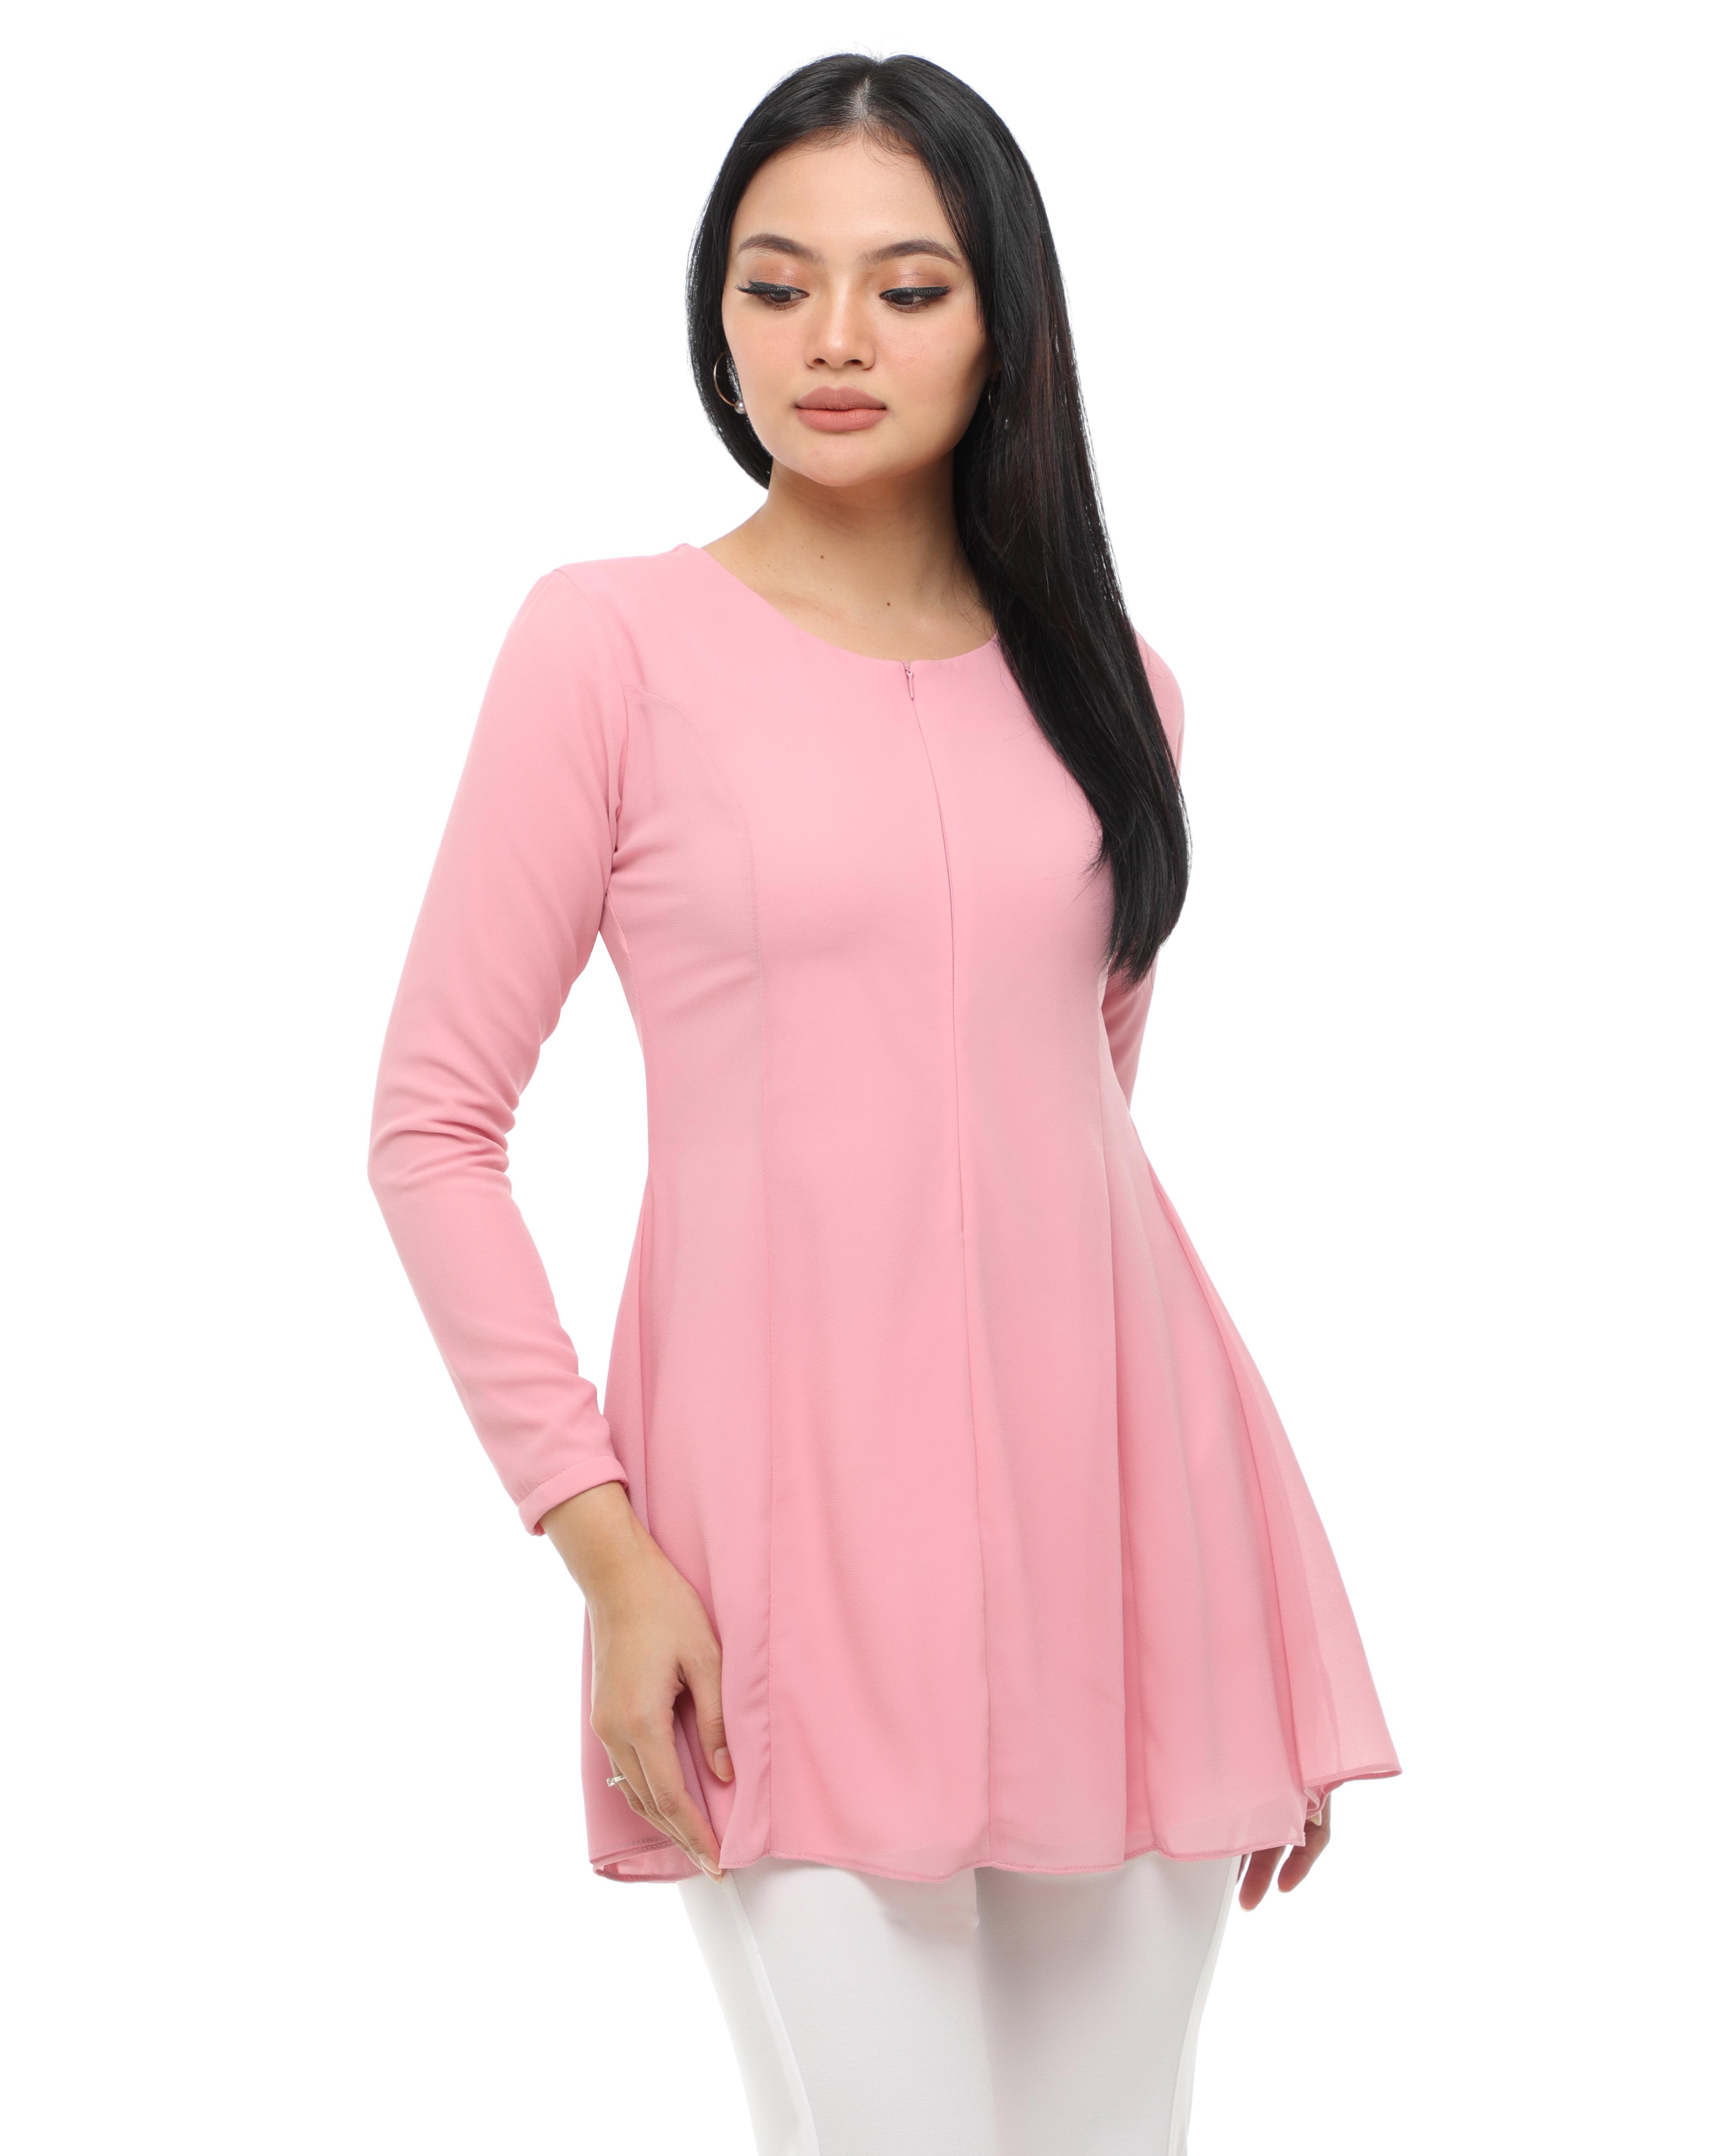 Klaudia v3 - Soft Pink